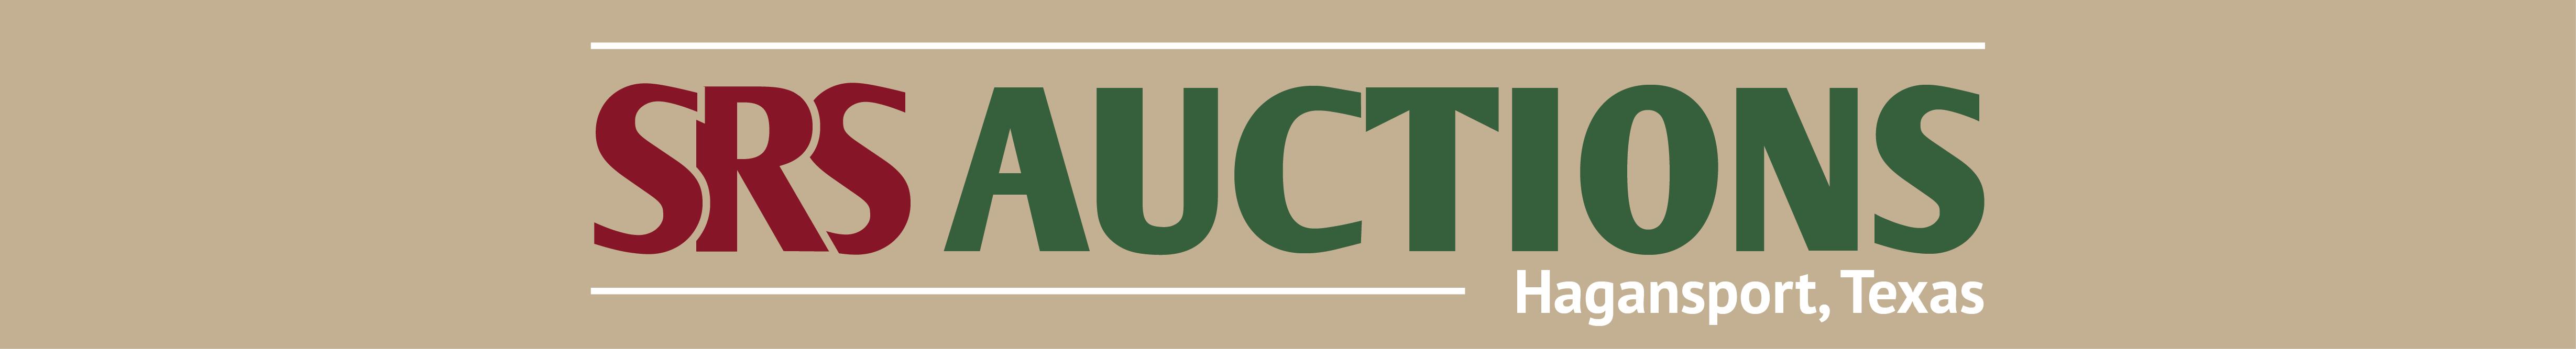 Sulphur River Saddlery, Inc  | SRS Auctions